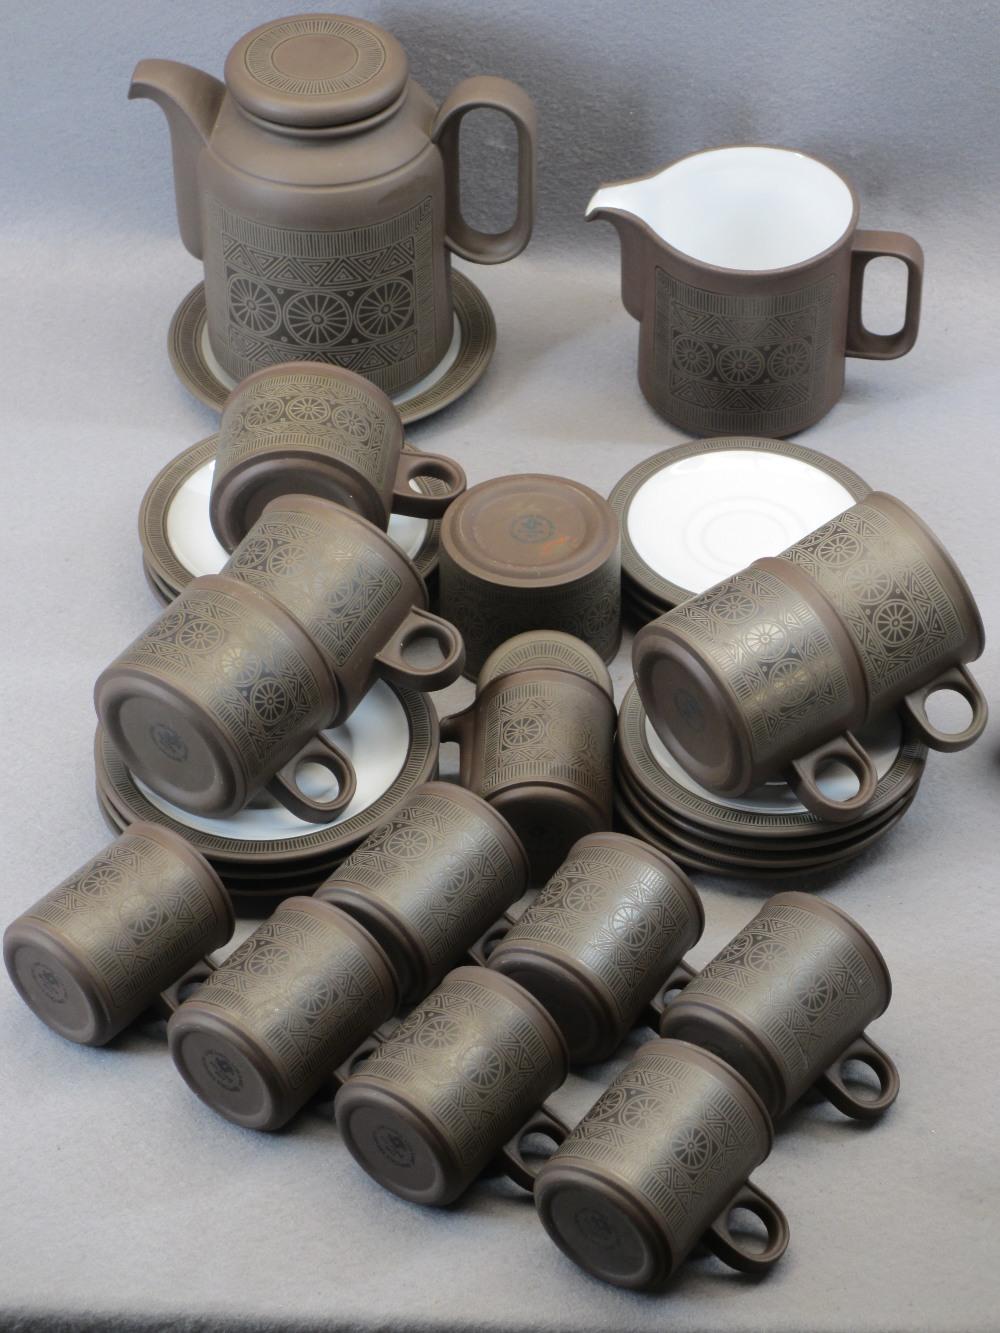 LANCASTER VITRAMIC HORNSEA POTTERY, TEA & COFFEE SET - 30 pieces Palatine 1977